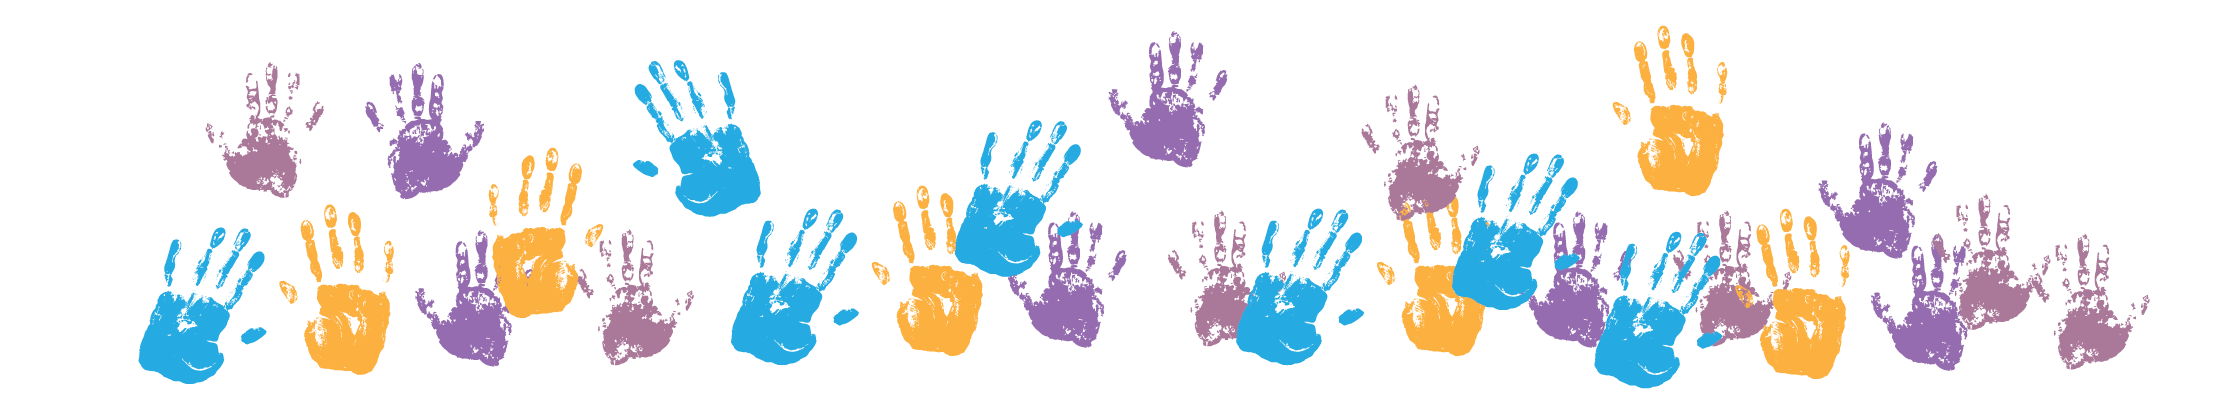 hands footer image